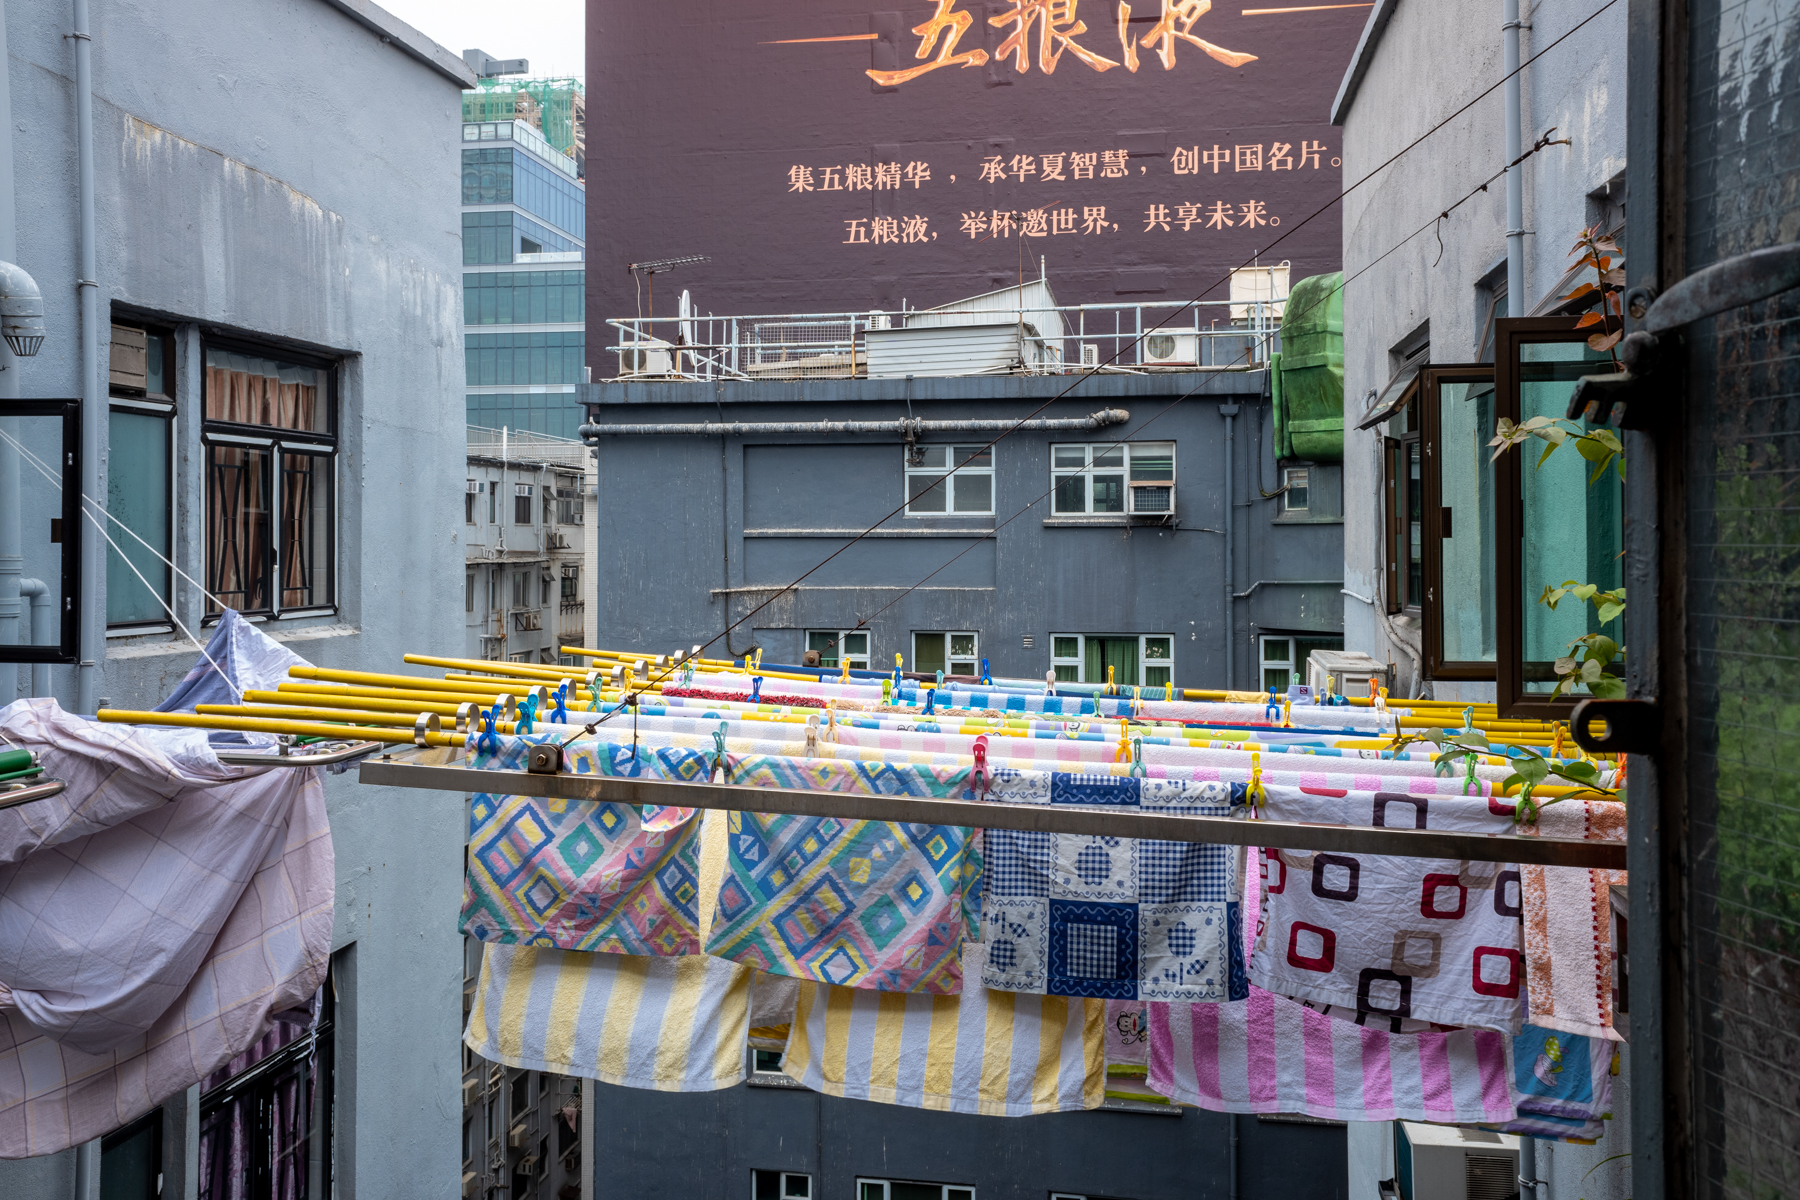 Chungking Mansions (10 of 10).jpg